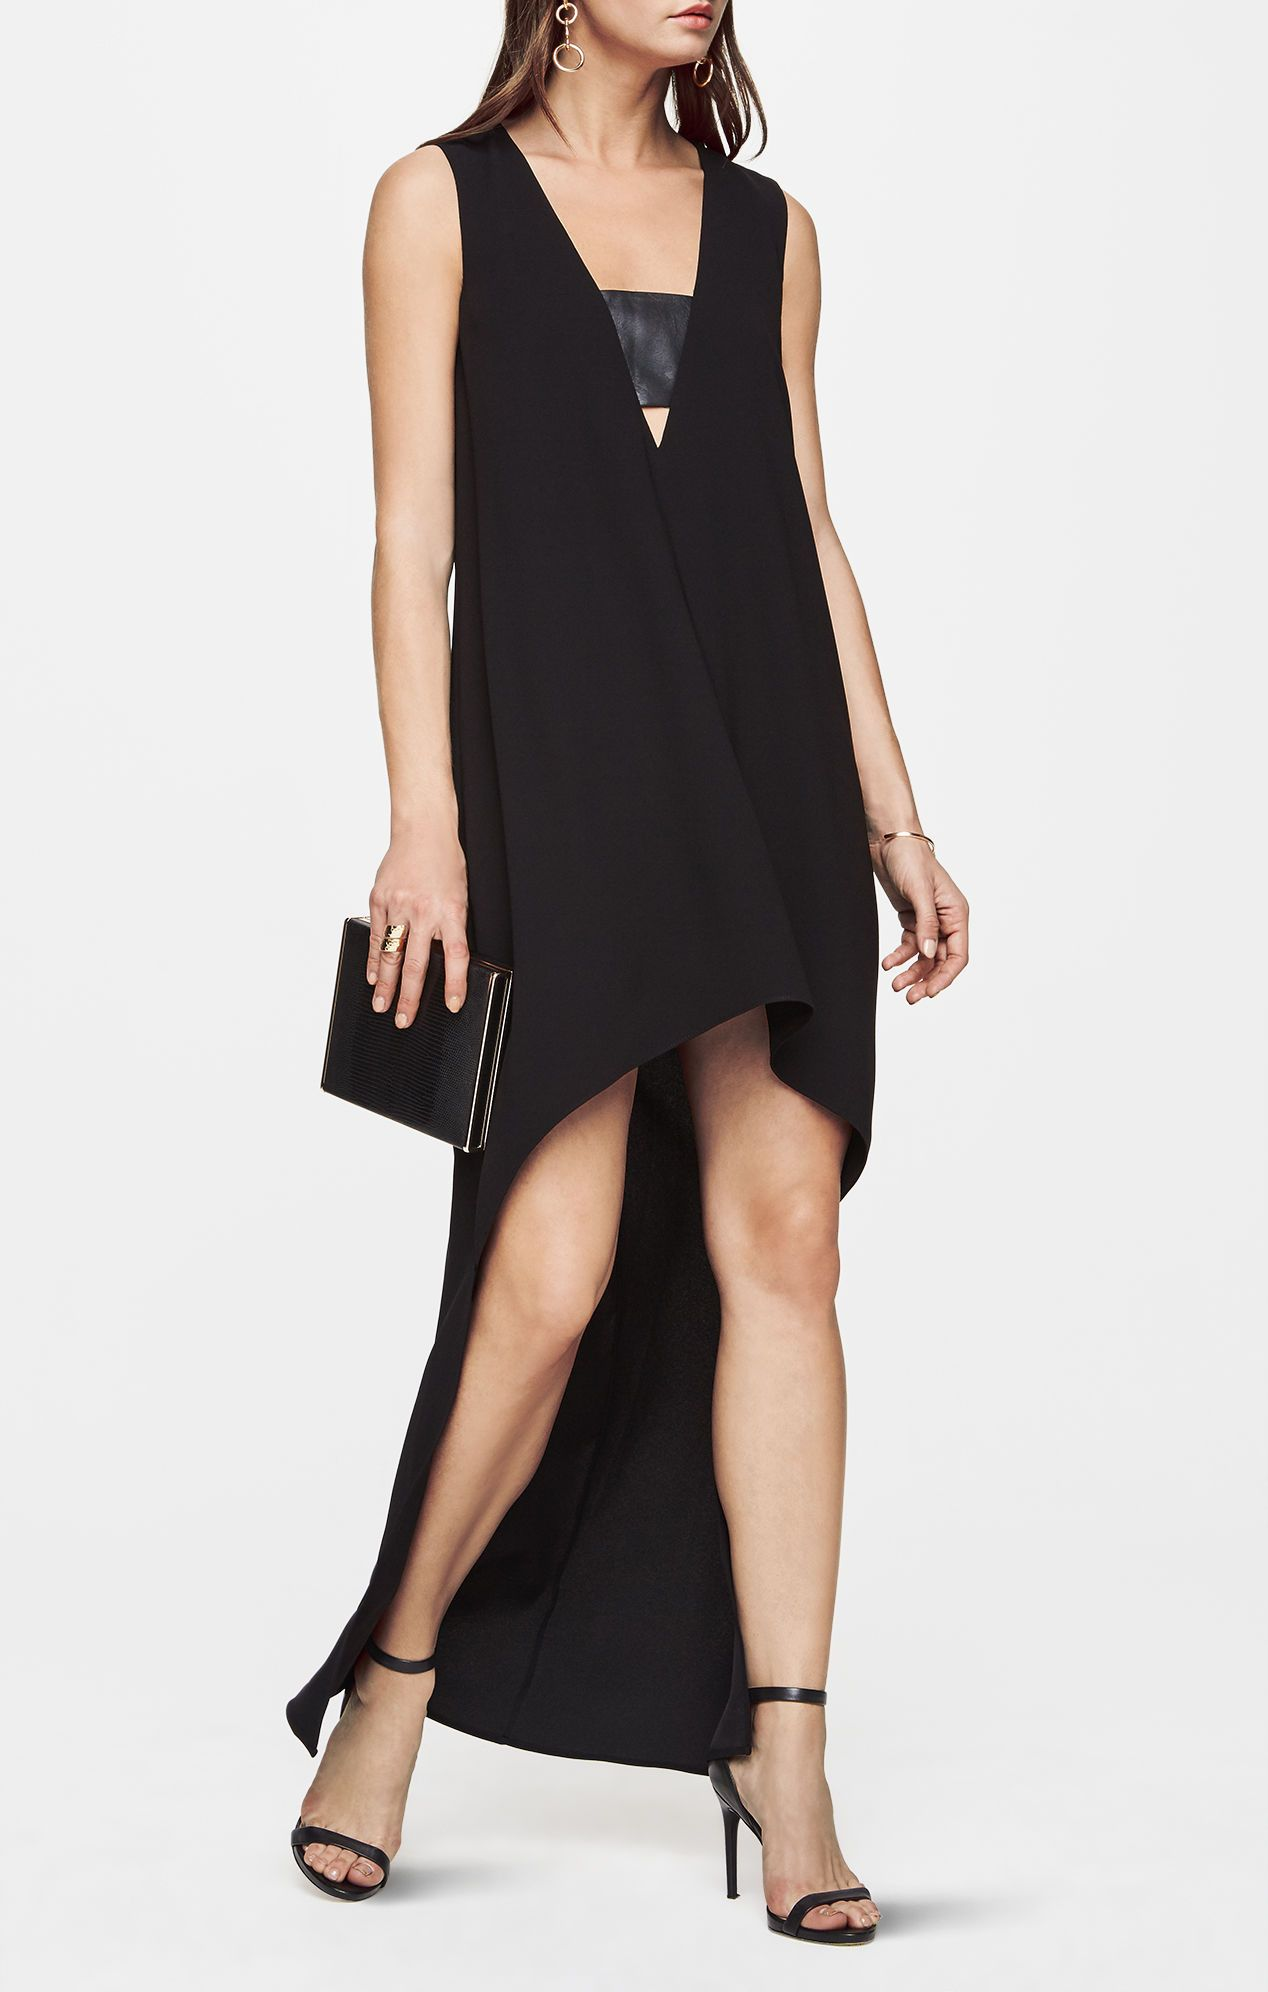 Amaryllis High Low Dress Moda Vestuarios